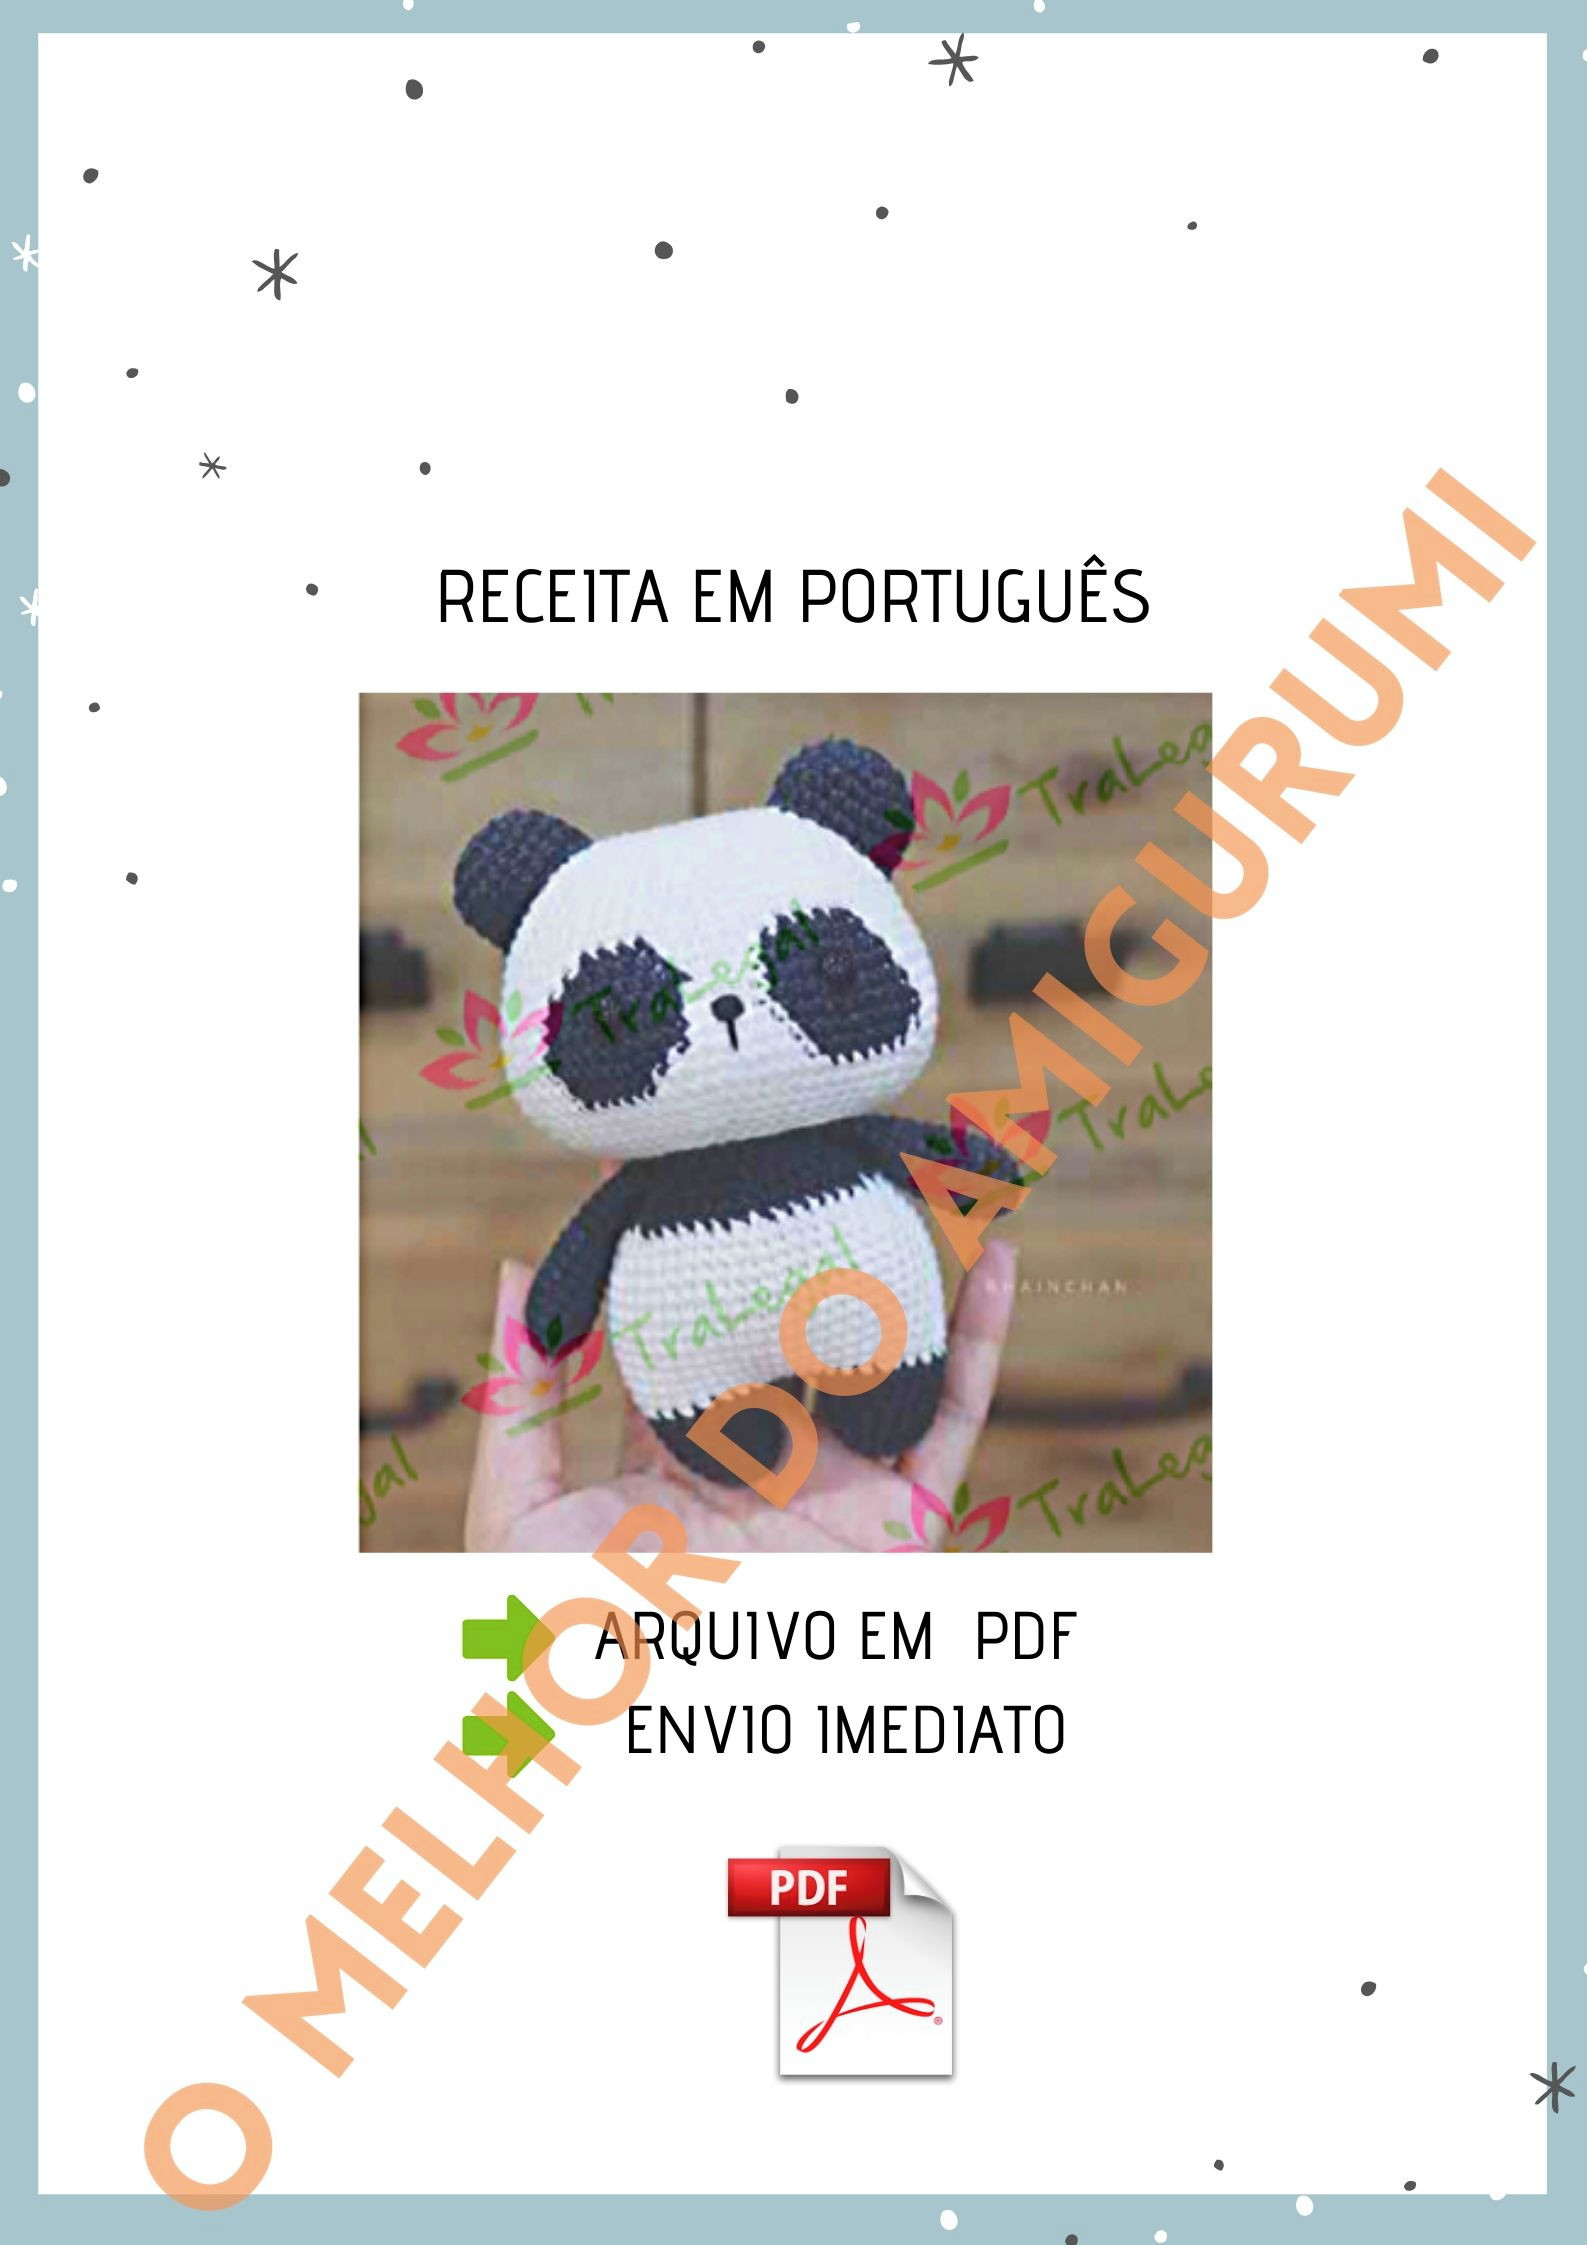 Receitas Amigurumi Ursos - Ursinho de Crochê Amigurumi (Receita ... | 2245x1587